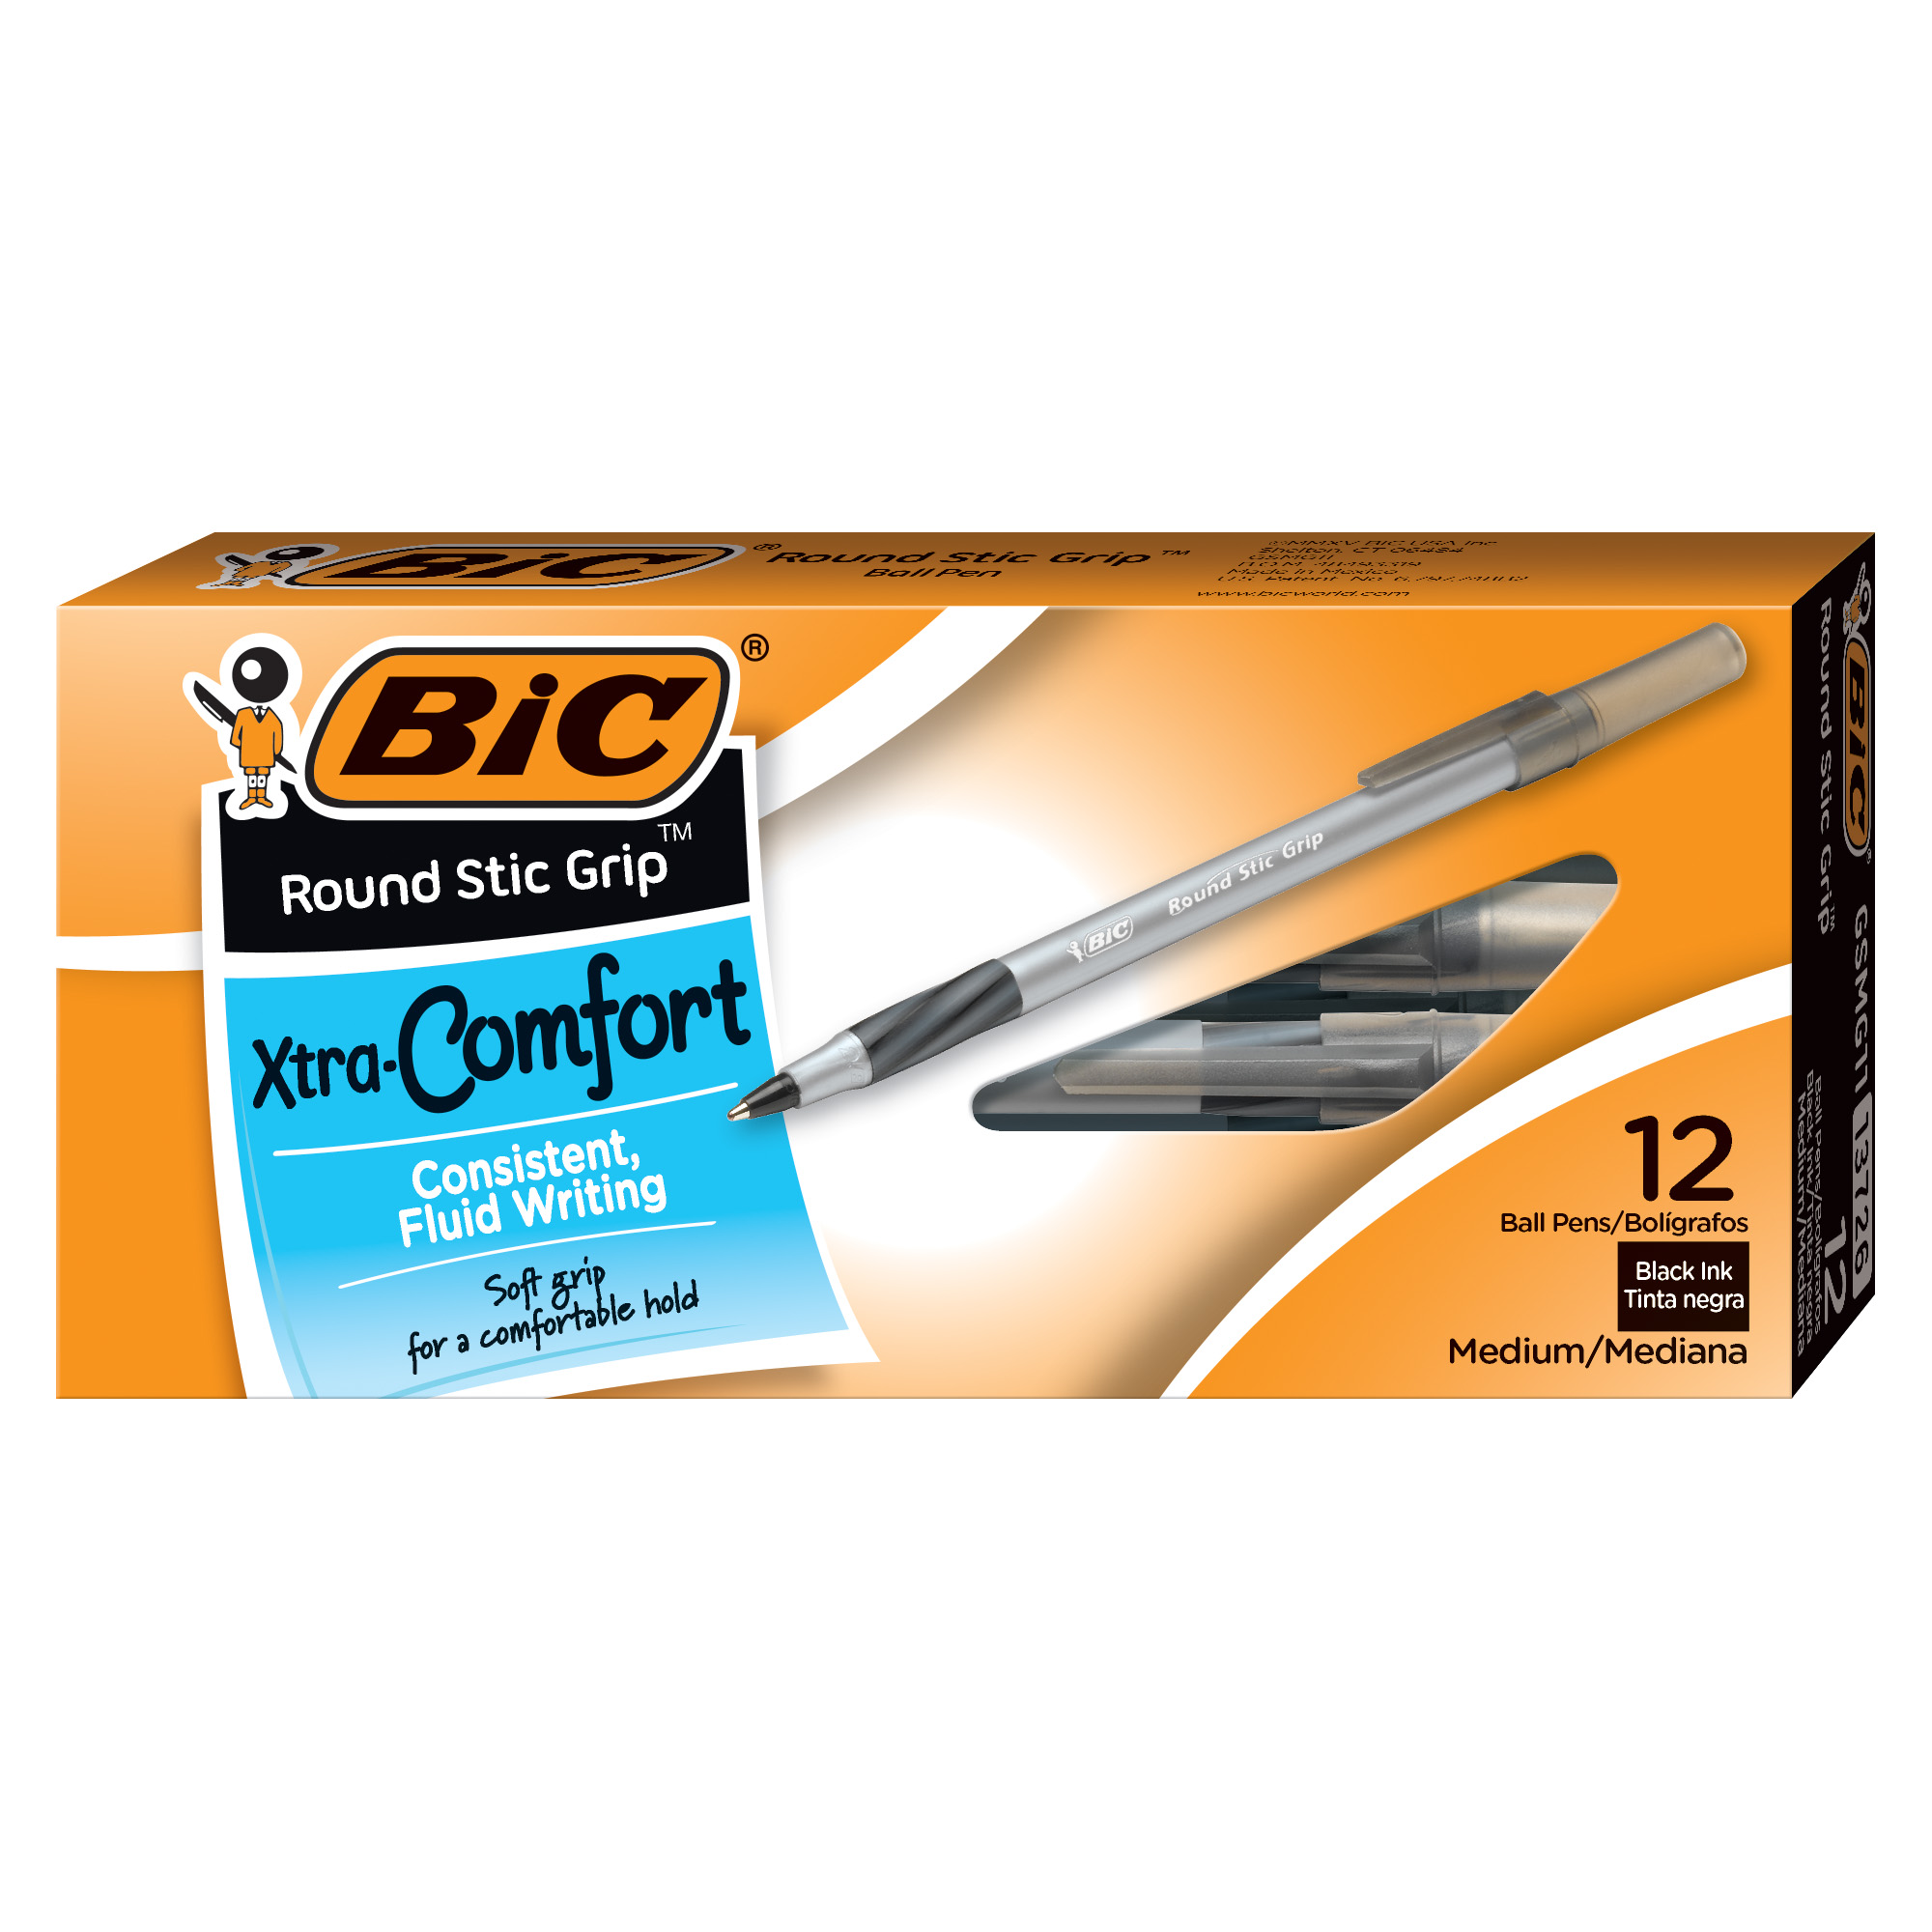 BIC Round Stic Grip Xtra Comfort Ball Pen, Medium Point (1.2 mm), Black, 24 Count